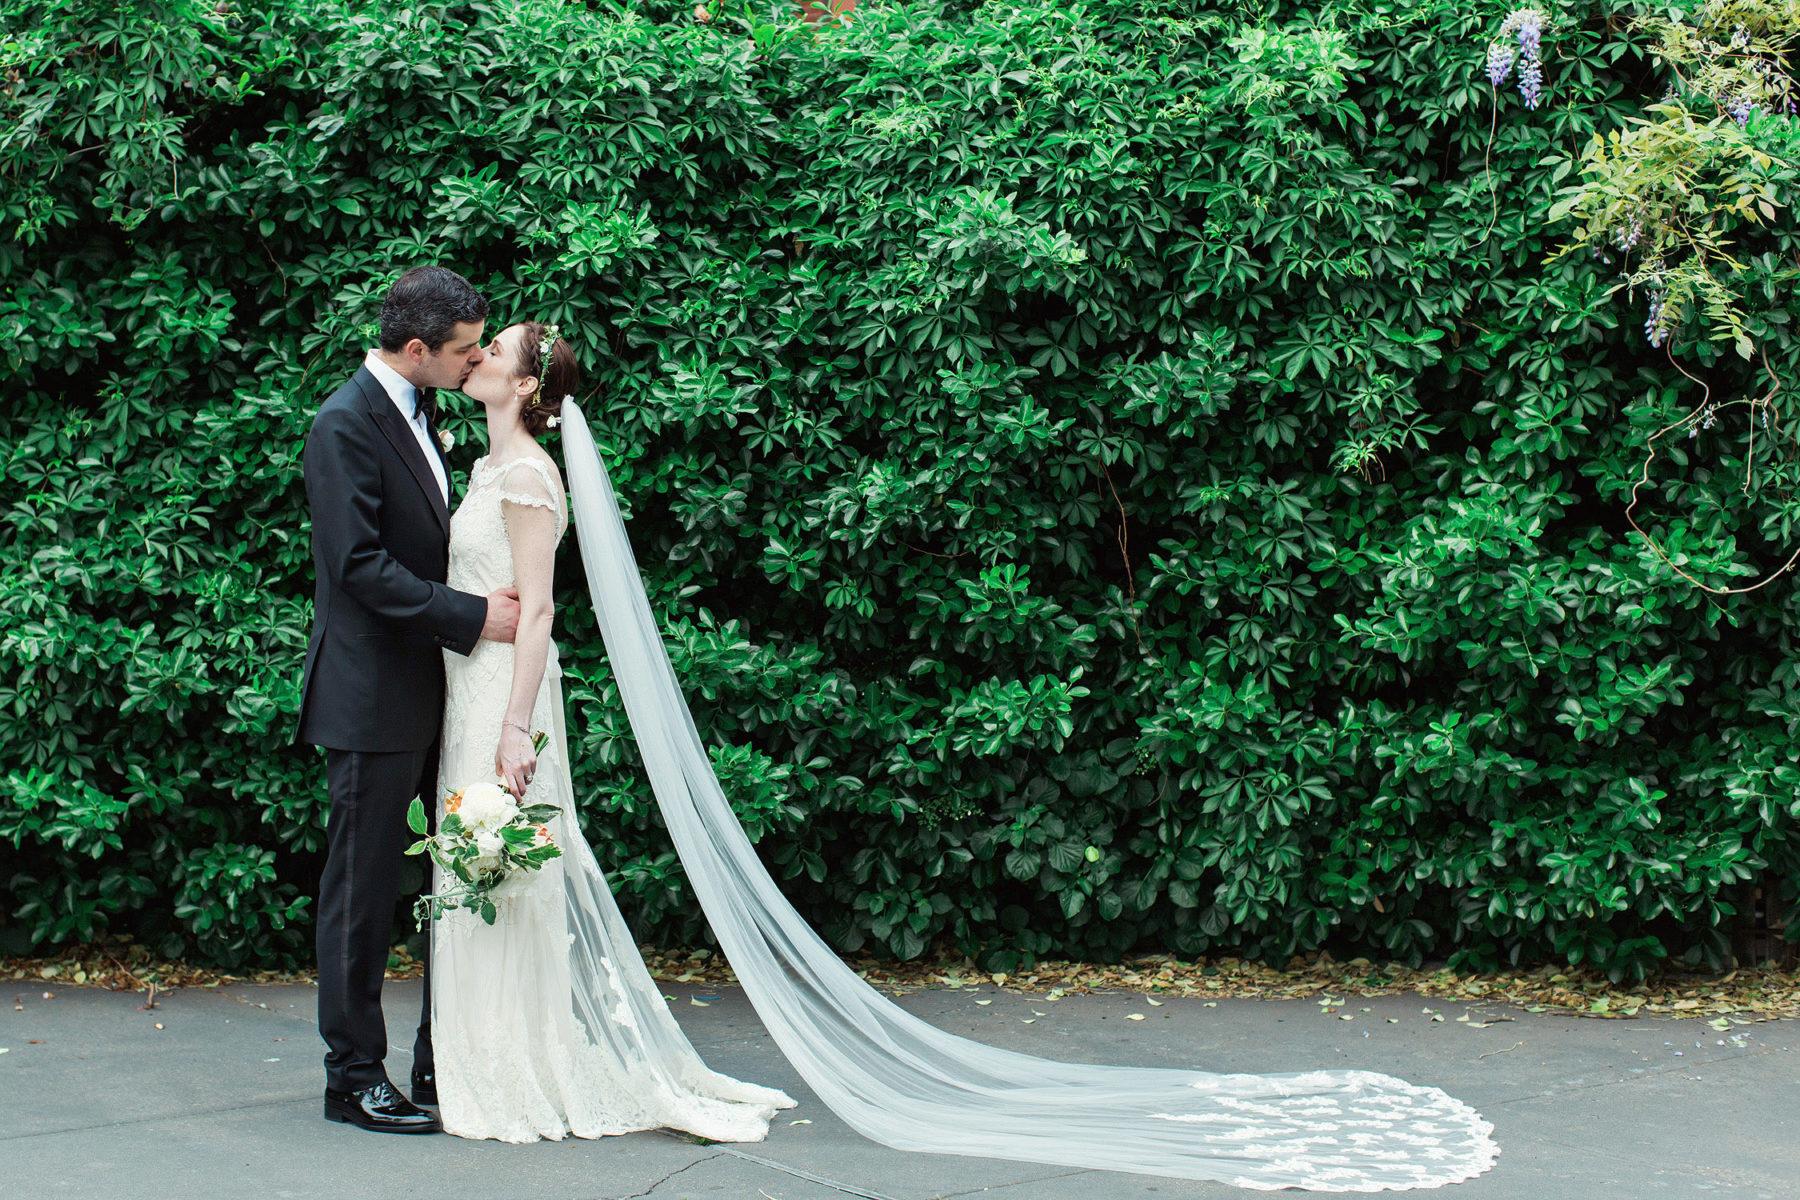 Bride and Groom Portraits in Brooklyn - Top Brooklyn Wedding Photographer